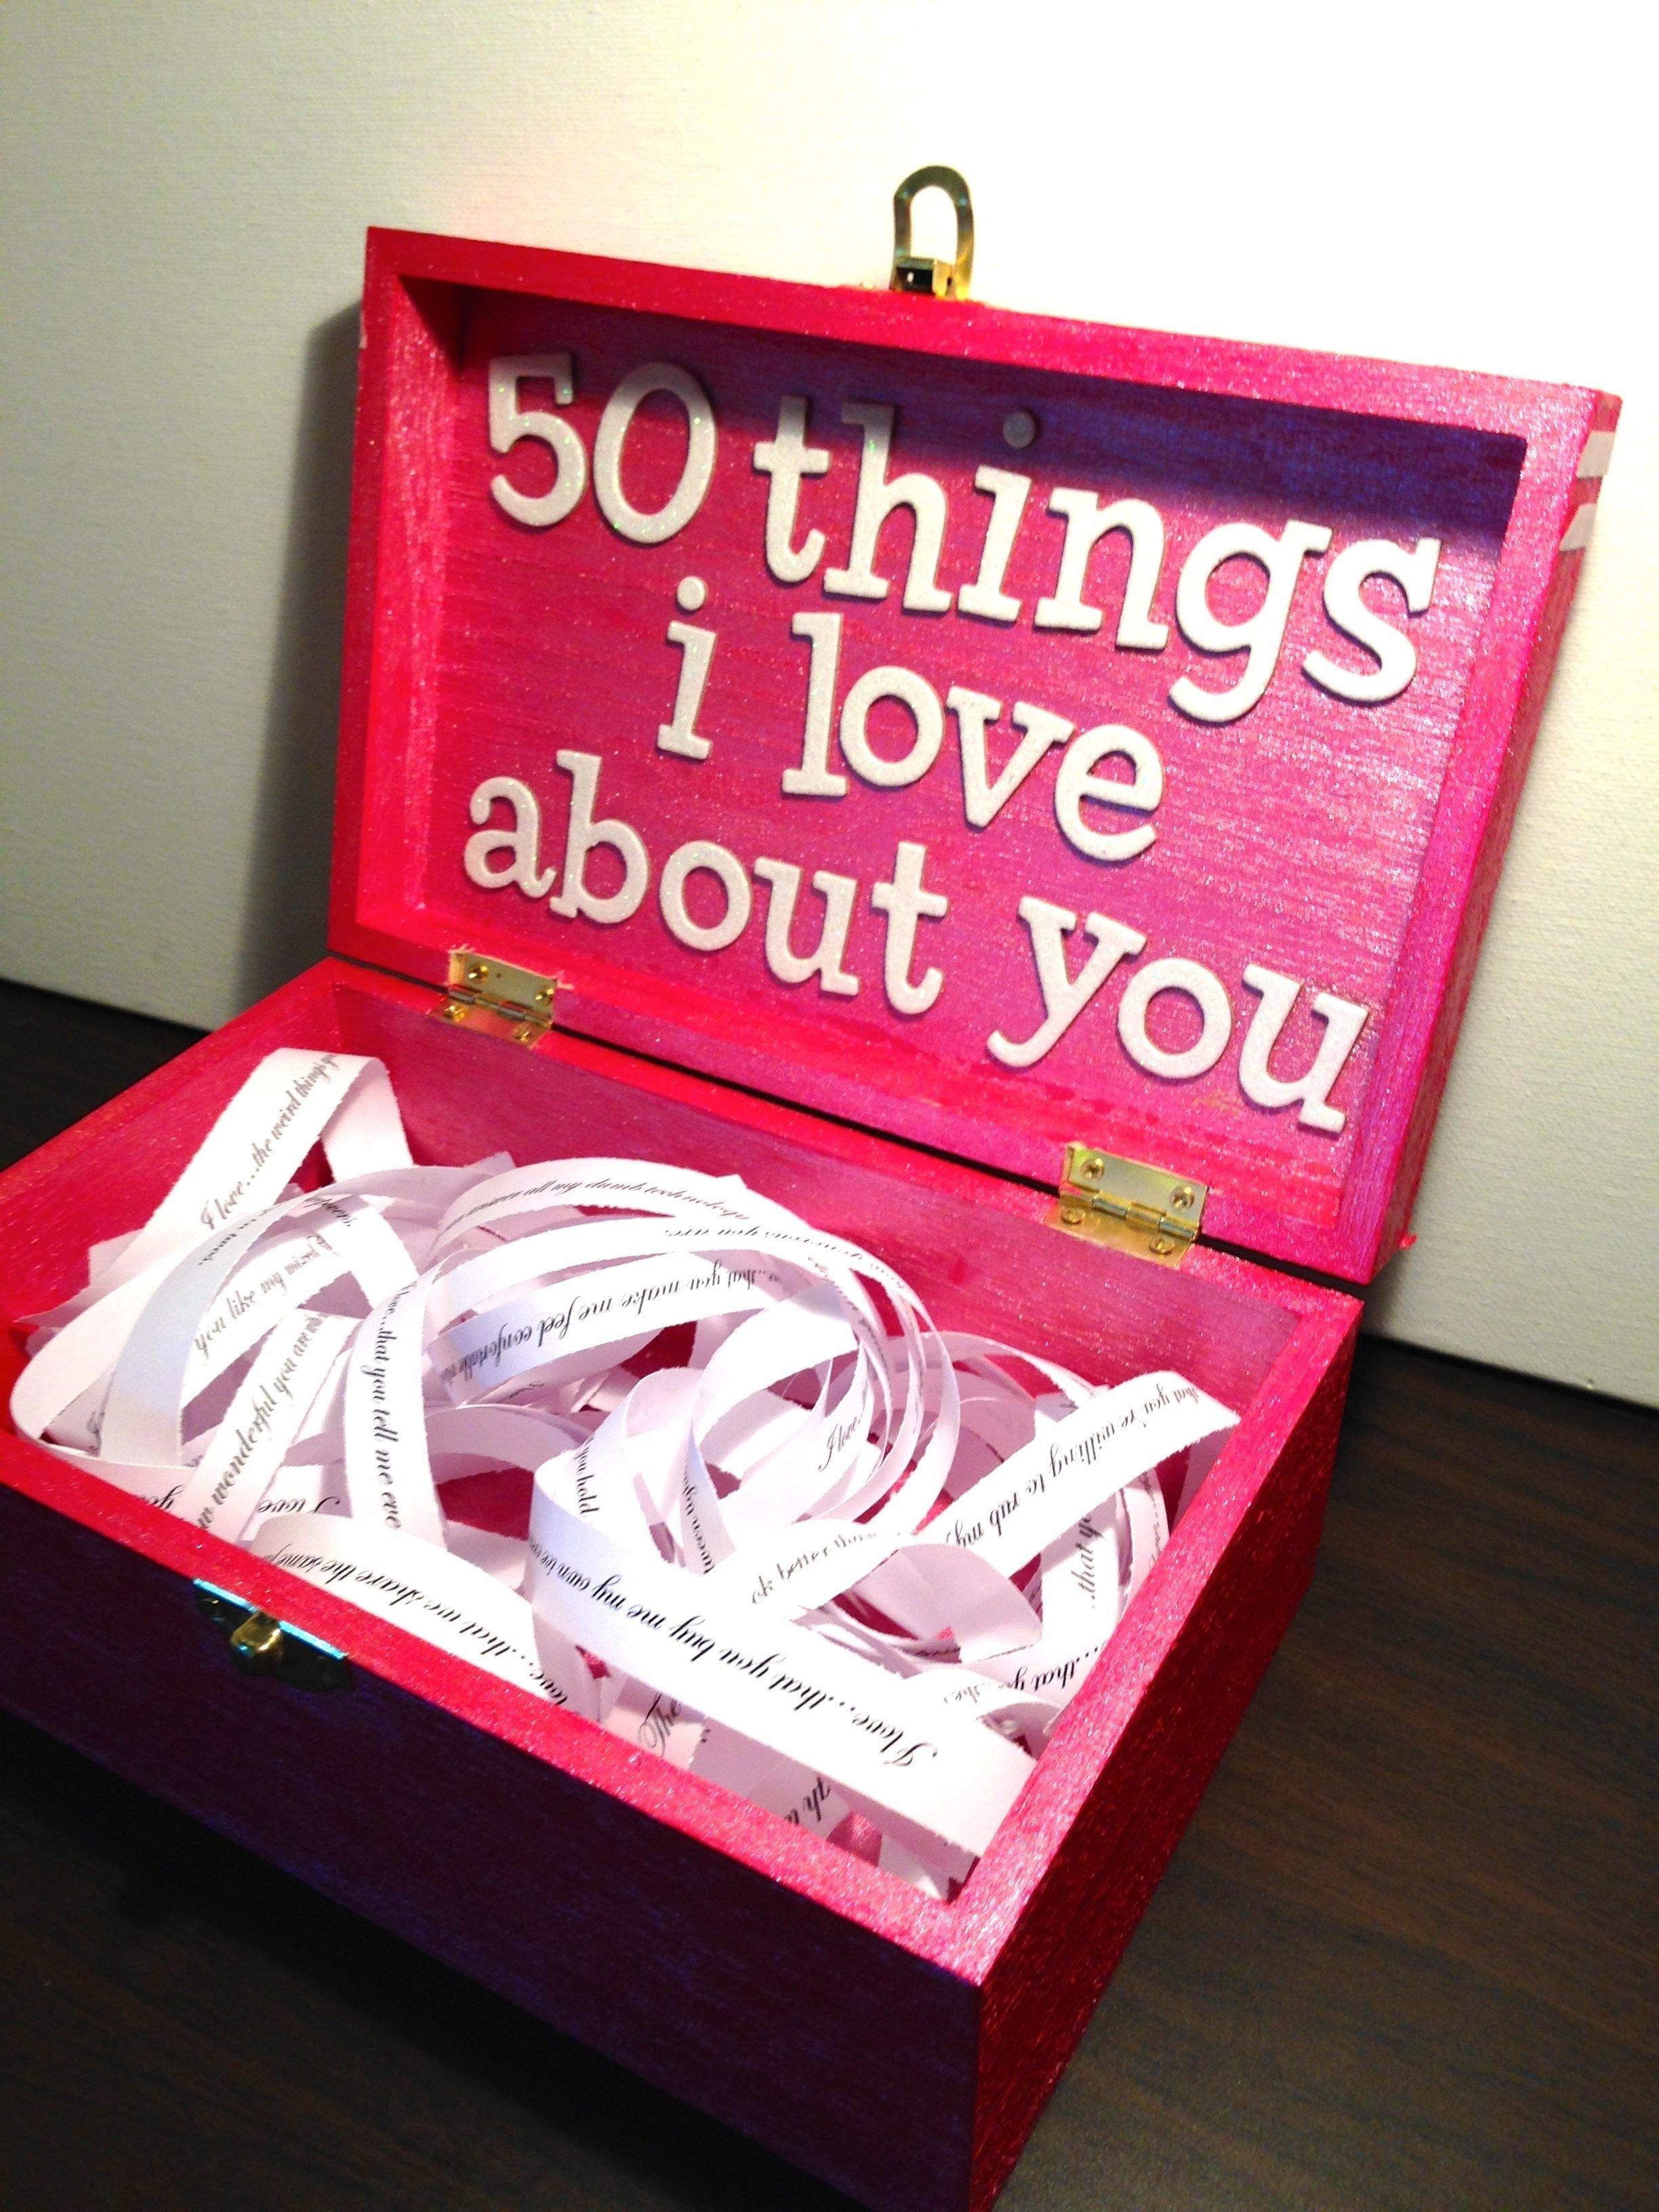 10 Fabulous Thoughtful Gift Ideas For Girlfriend 2021